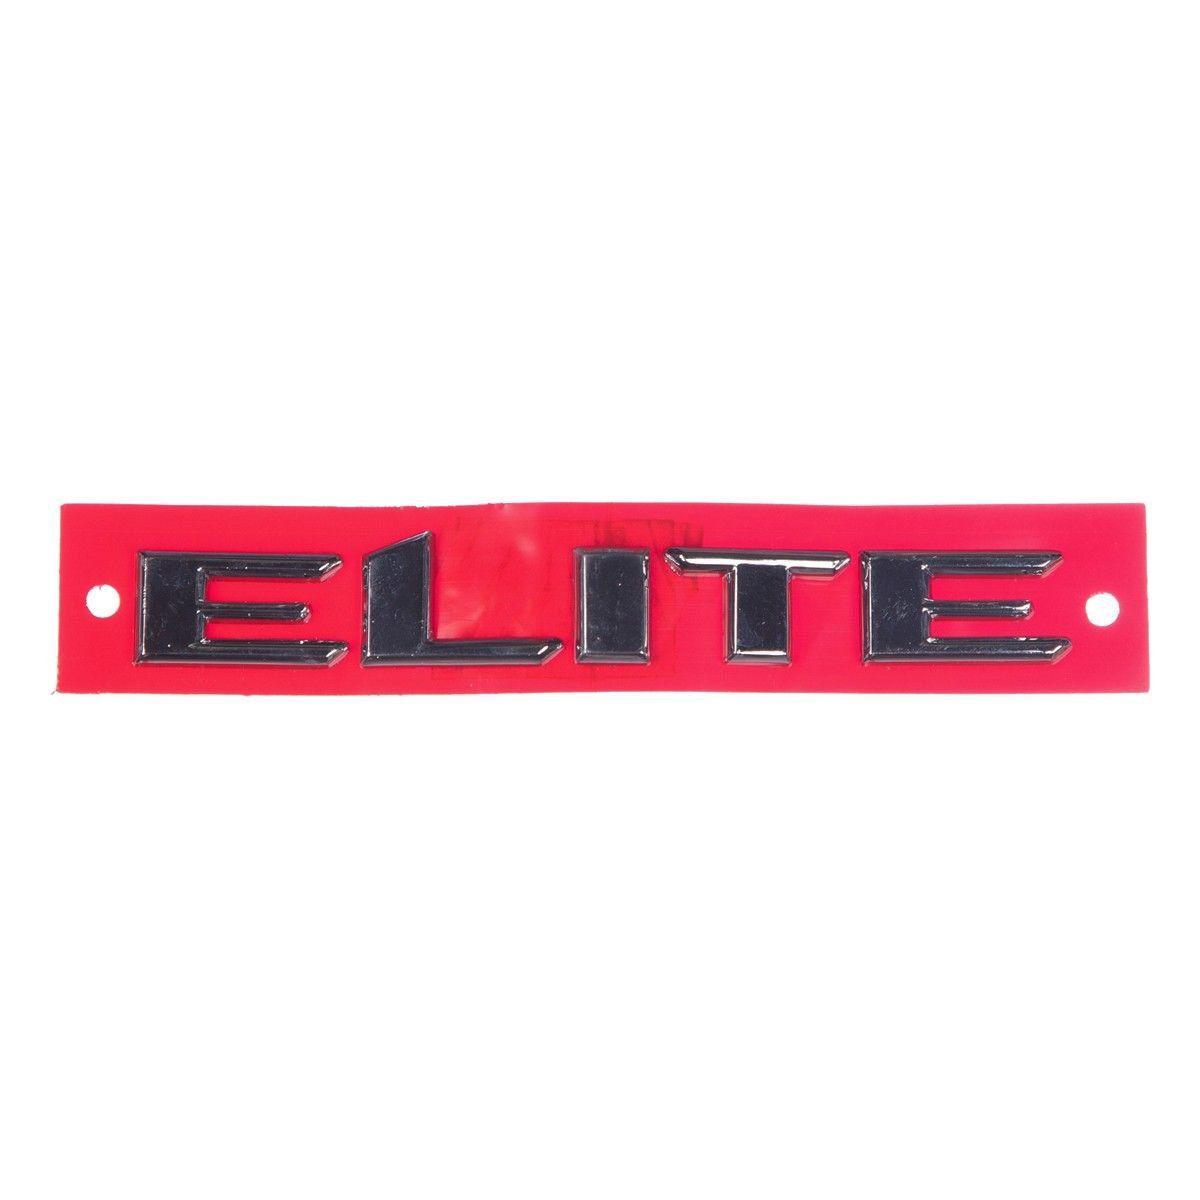 Emblema *elite* porta dianteira- Astra/Vectra novo 2006 a 2011